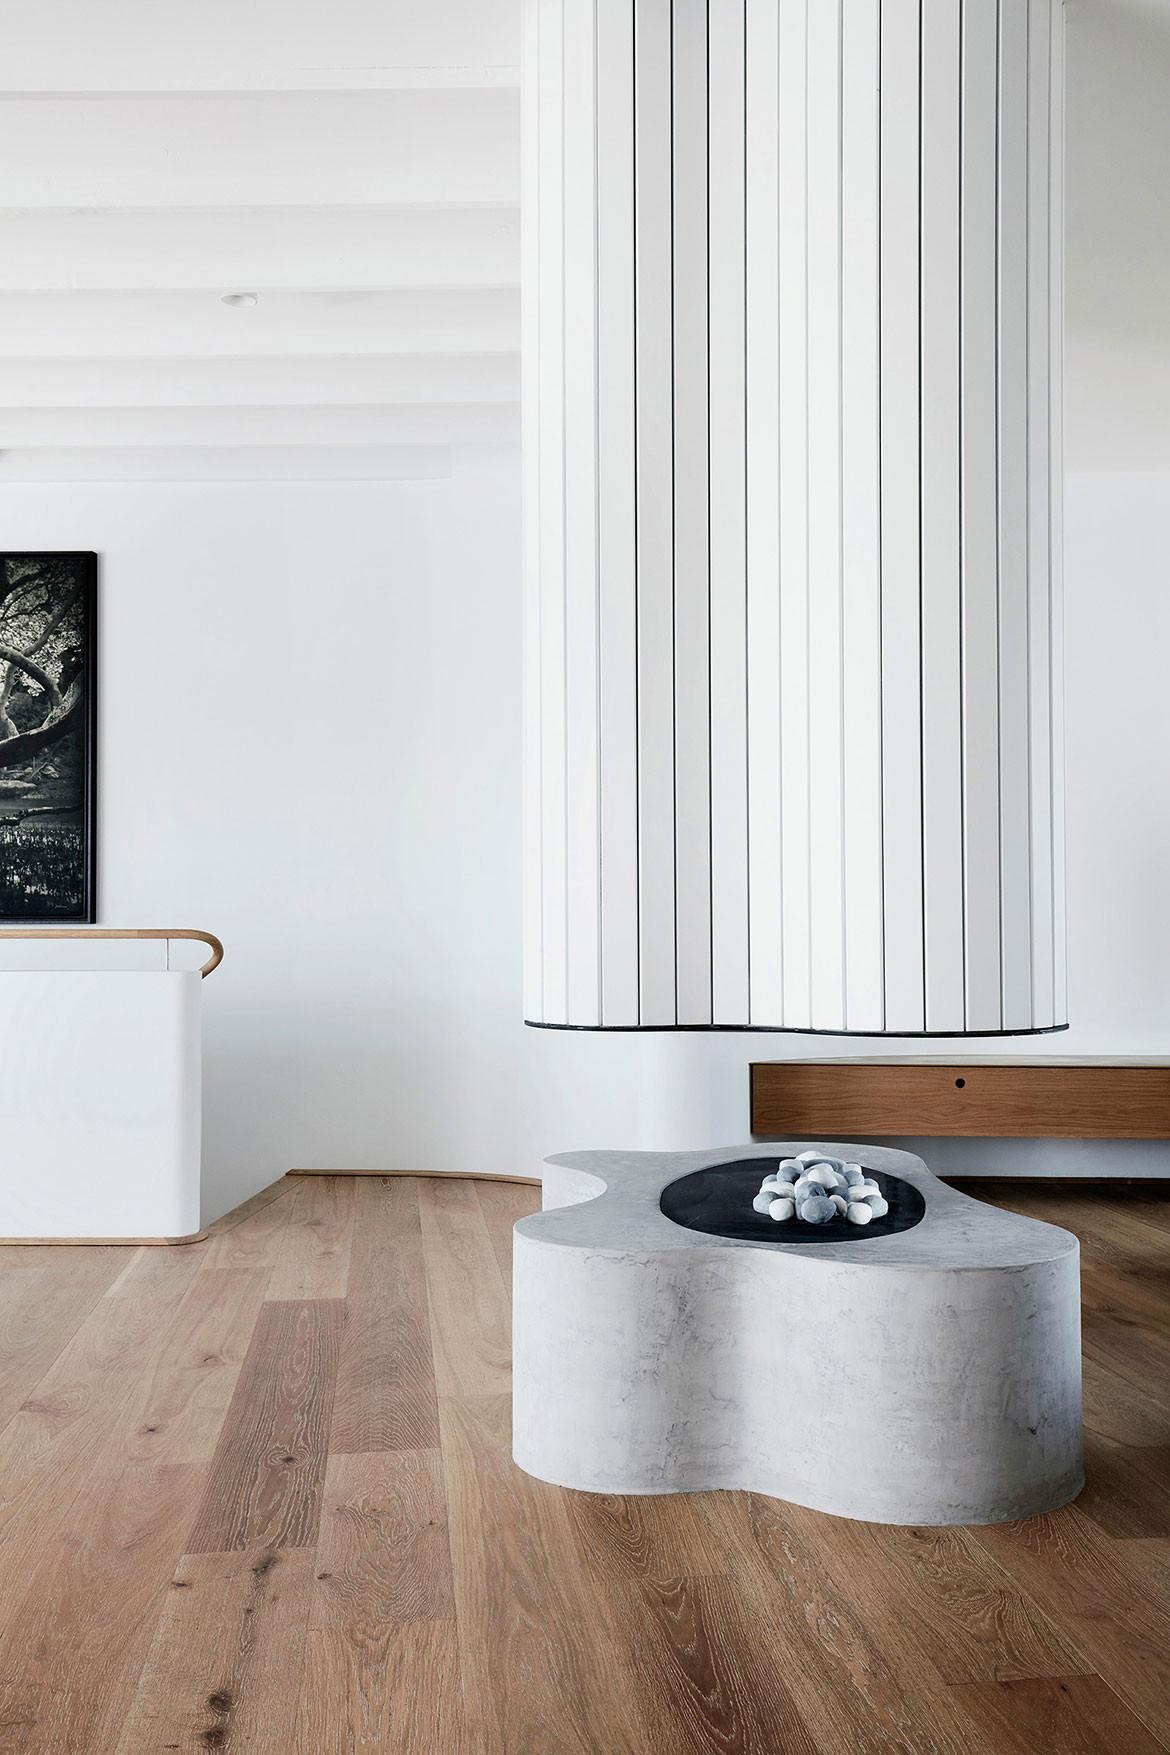 Tamas Tee House Luigi Rosselli Architects fireplace